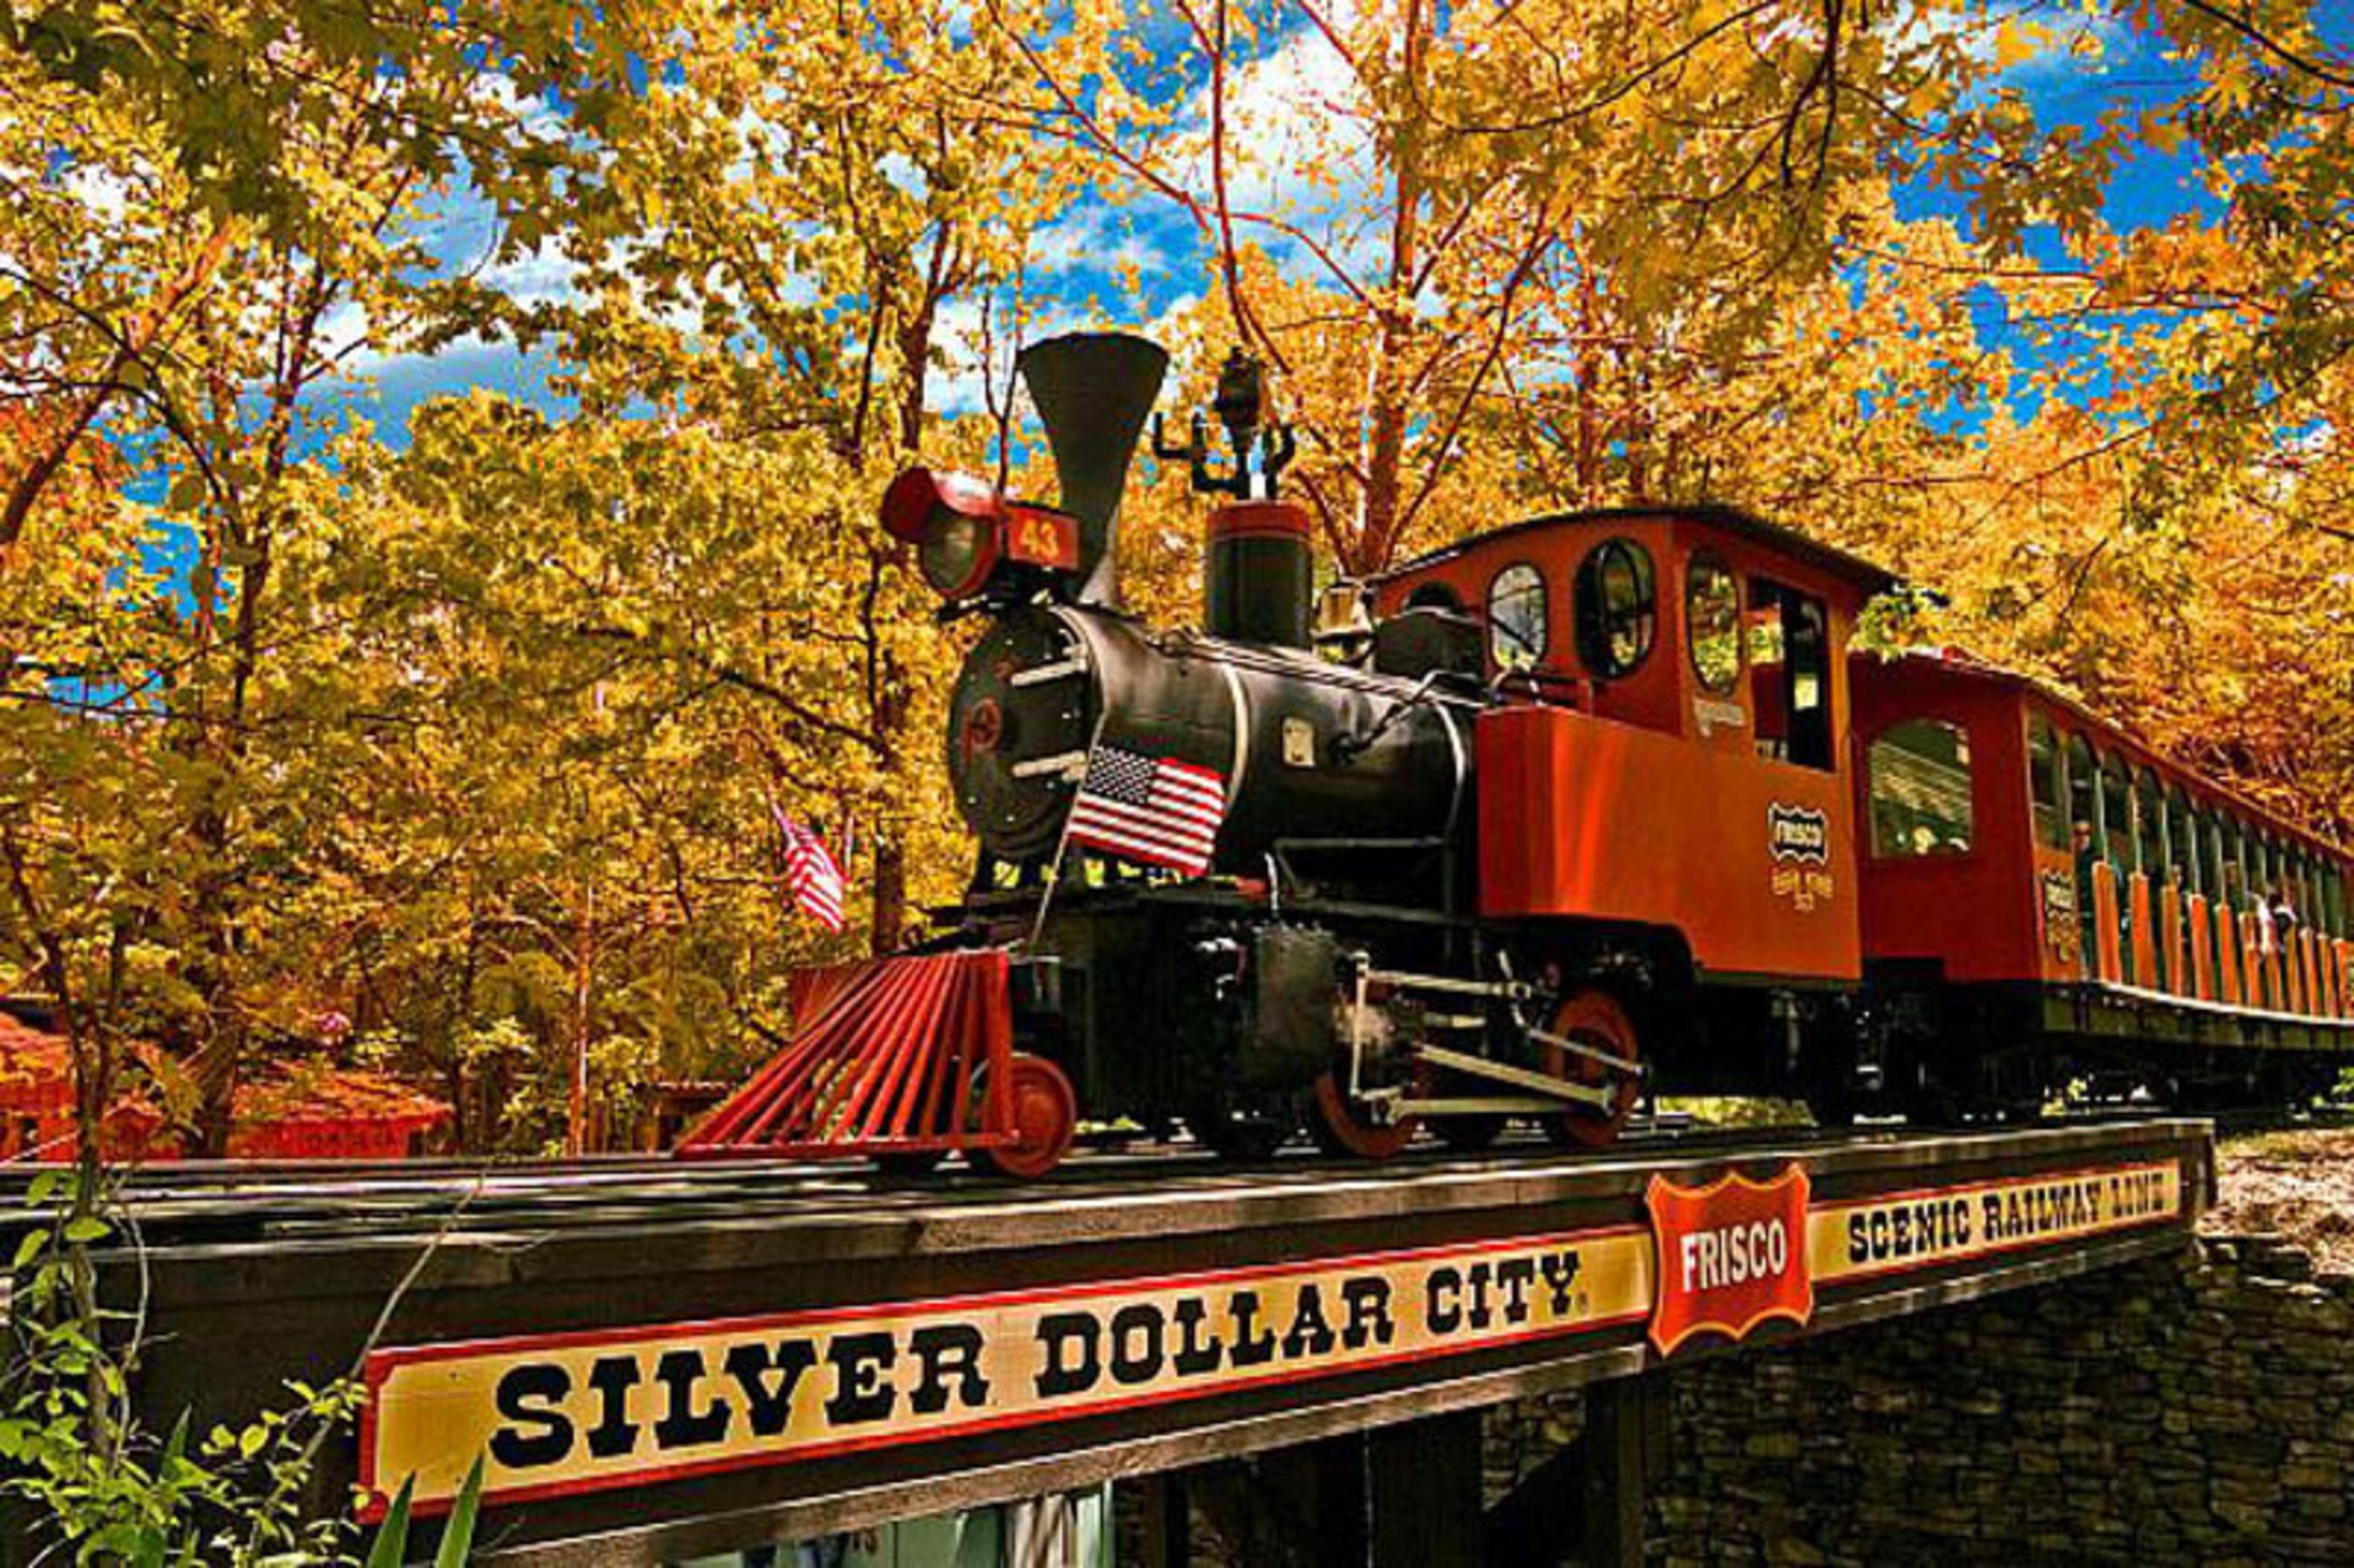 Silver Dollar City Train in Fall.  (PRNewsFoto/Reserve Direct)